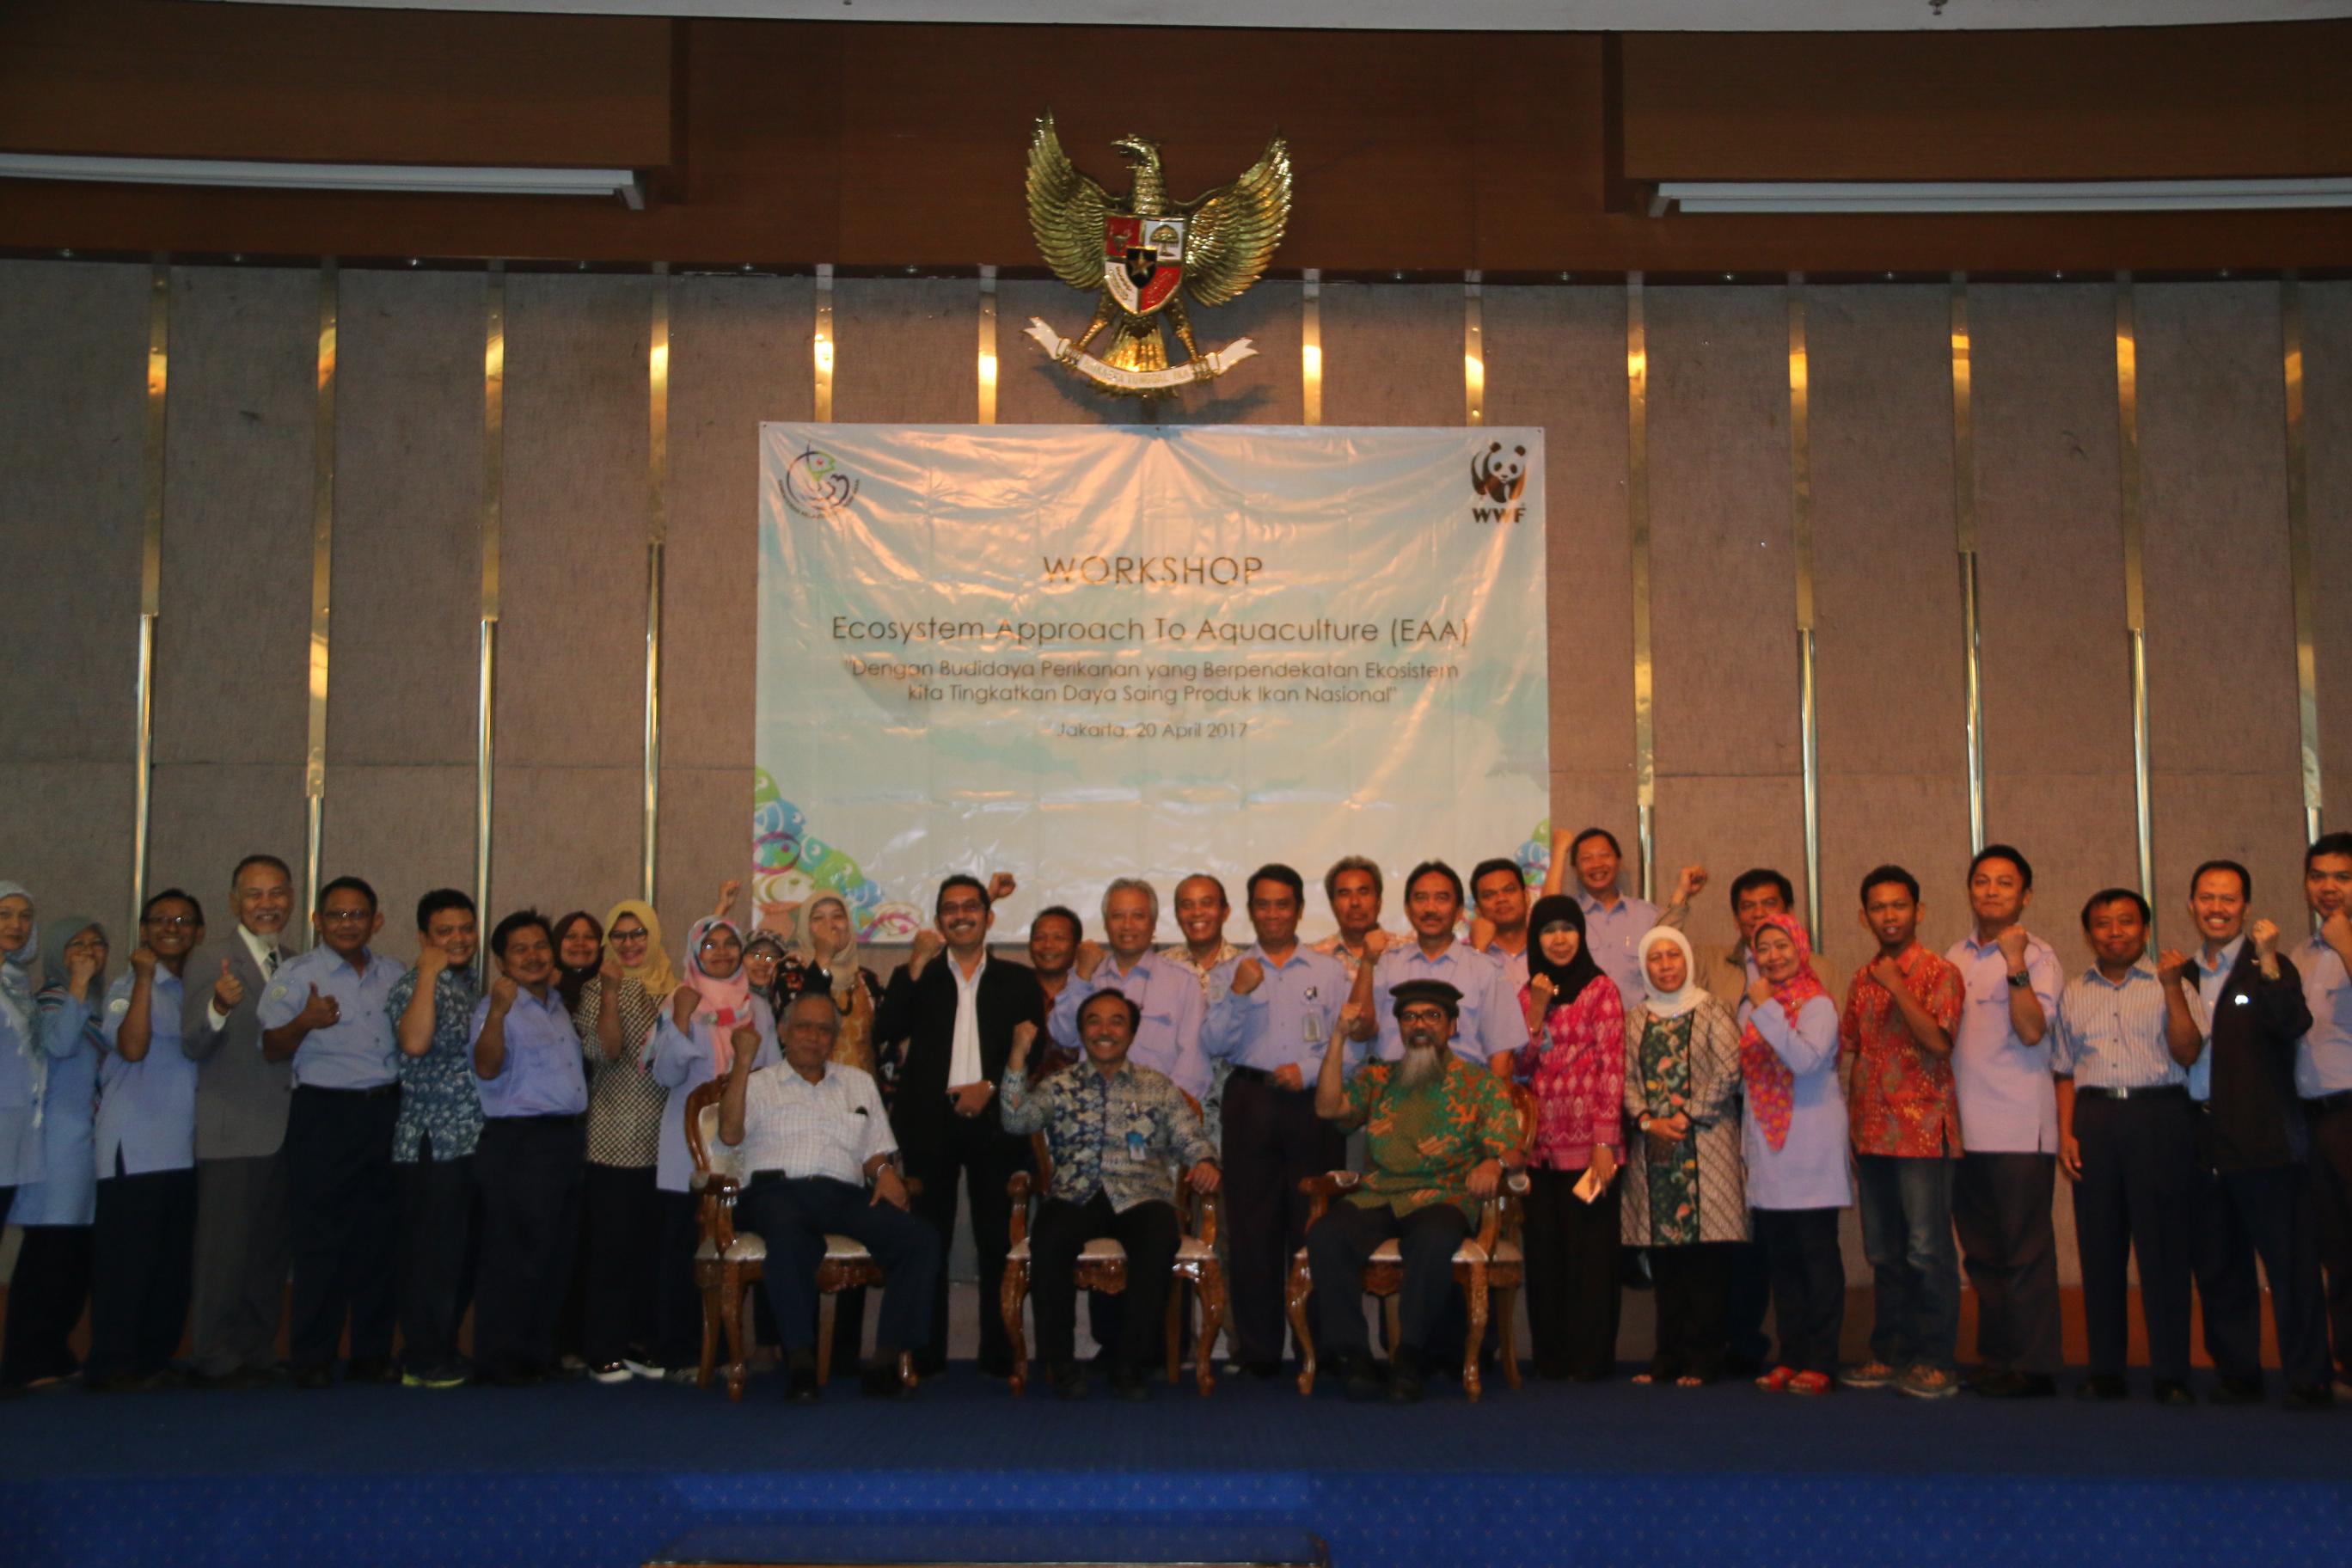 WORKSHOP ECOSYSTEM APPROACH TO AQUACULTURE KERJASAMA DENGAN WWF DI JAKARTA